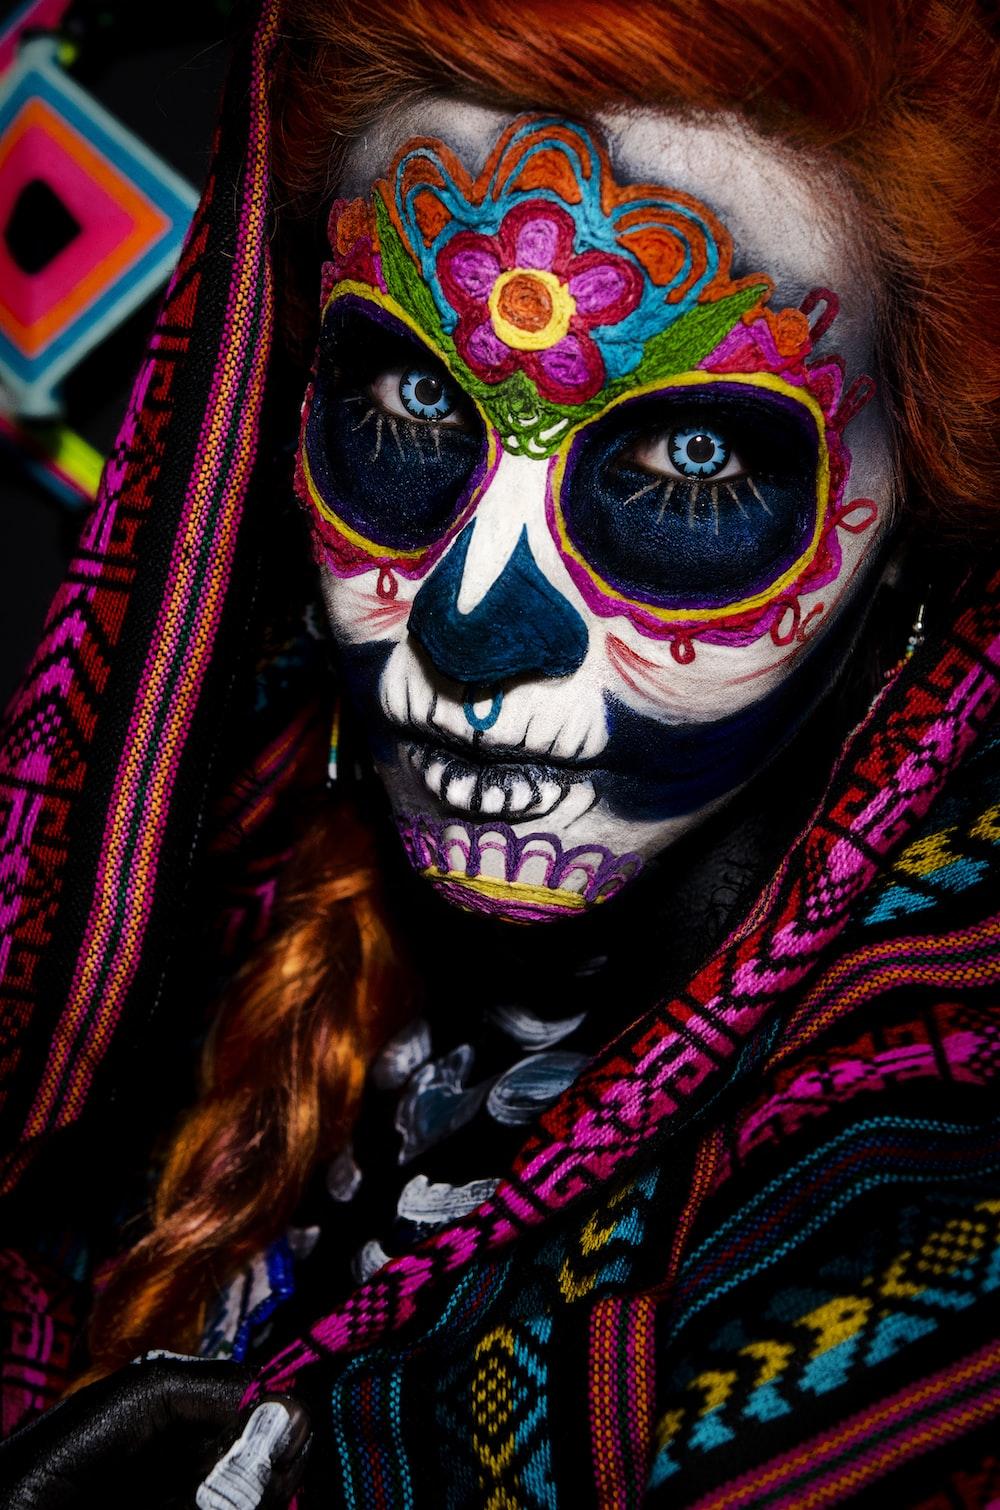 Muerte face painting